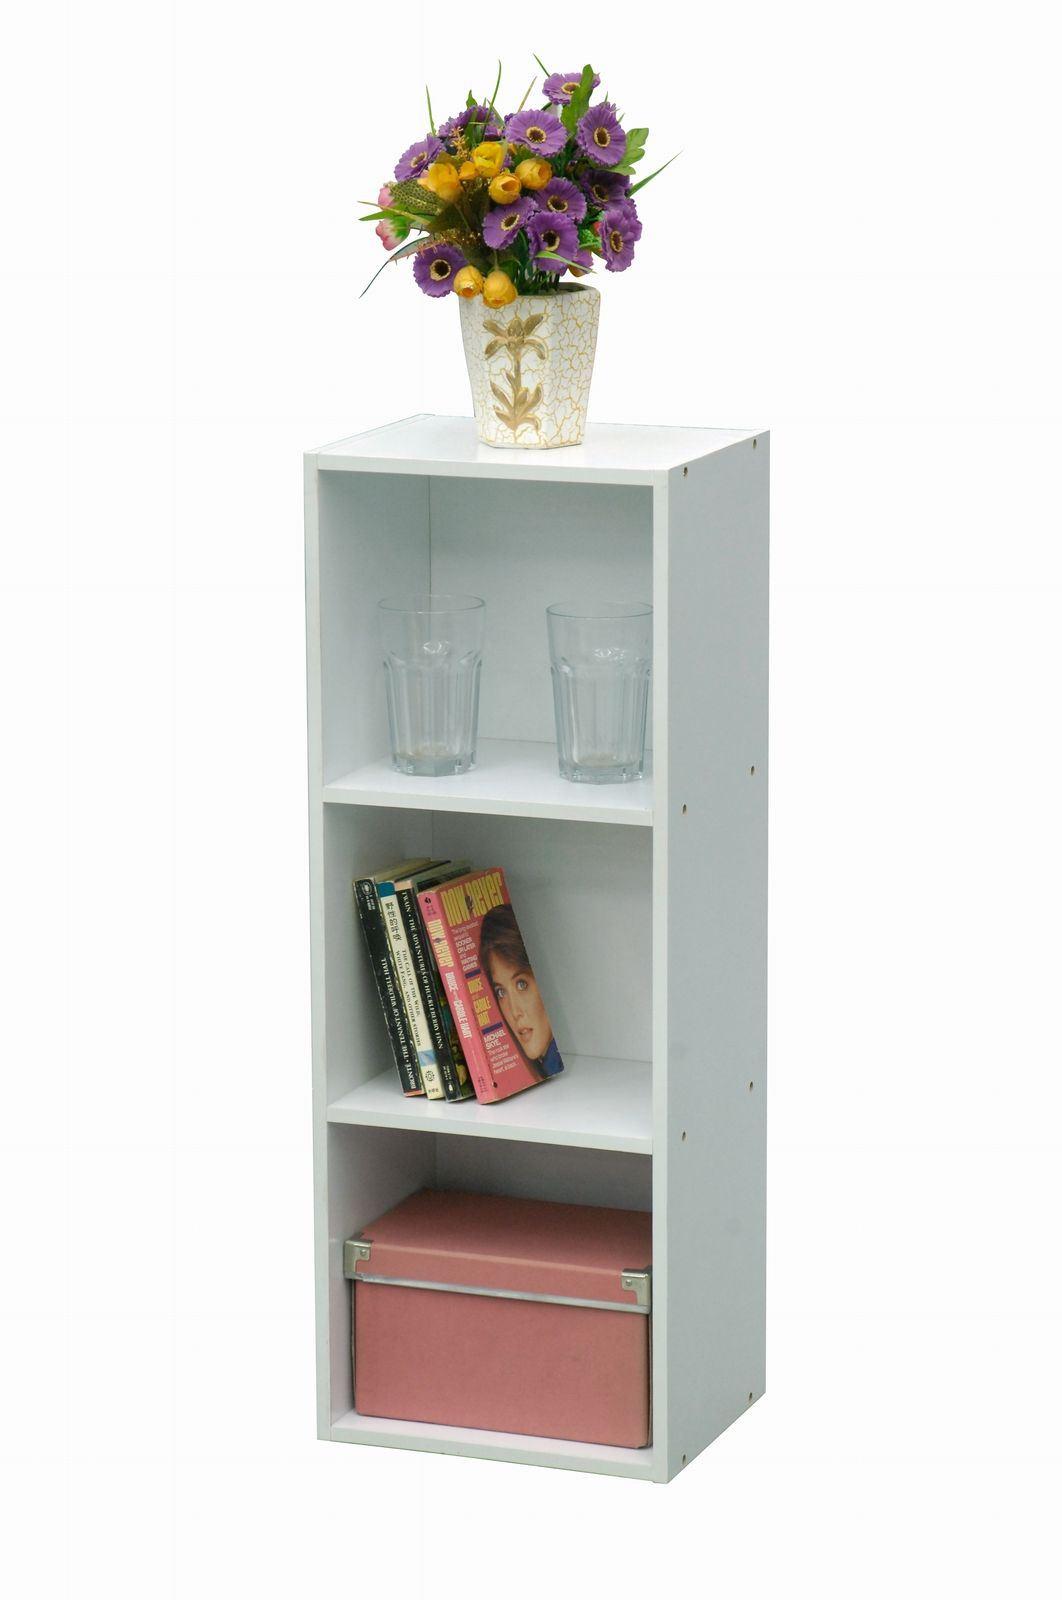 1 2 3 4 tier white wooden bookcase shelf display storage. Black Bedroom Furniture Sets. Home Design Ideas